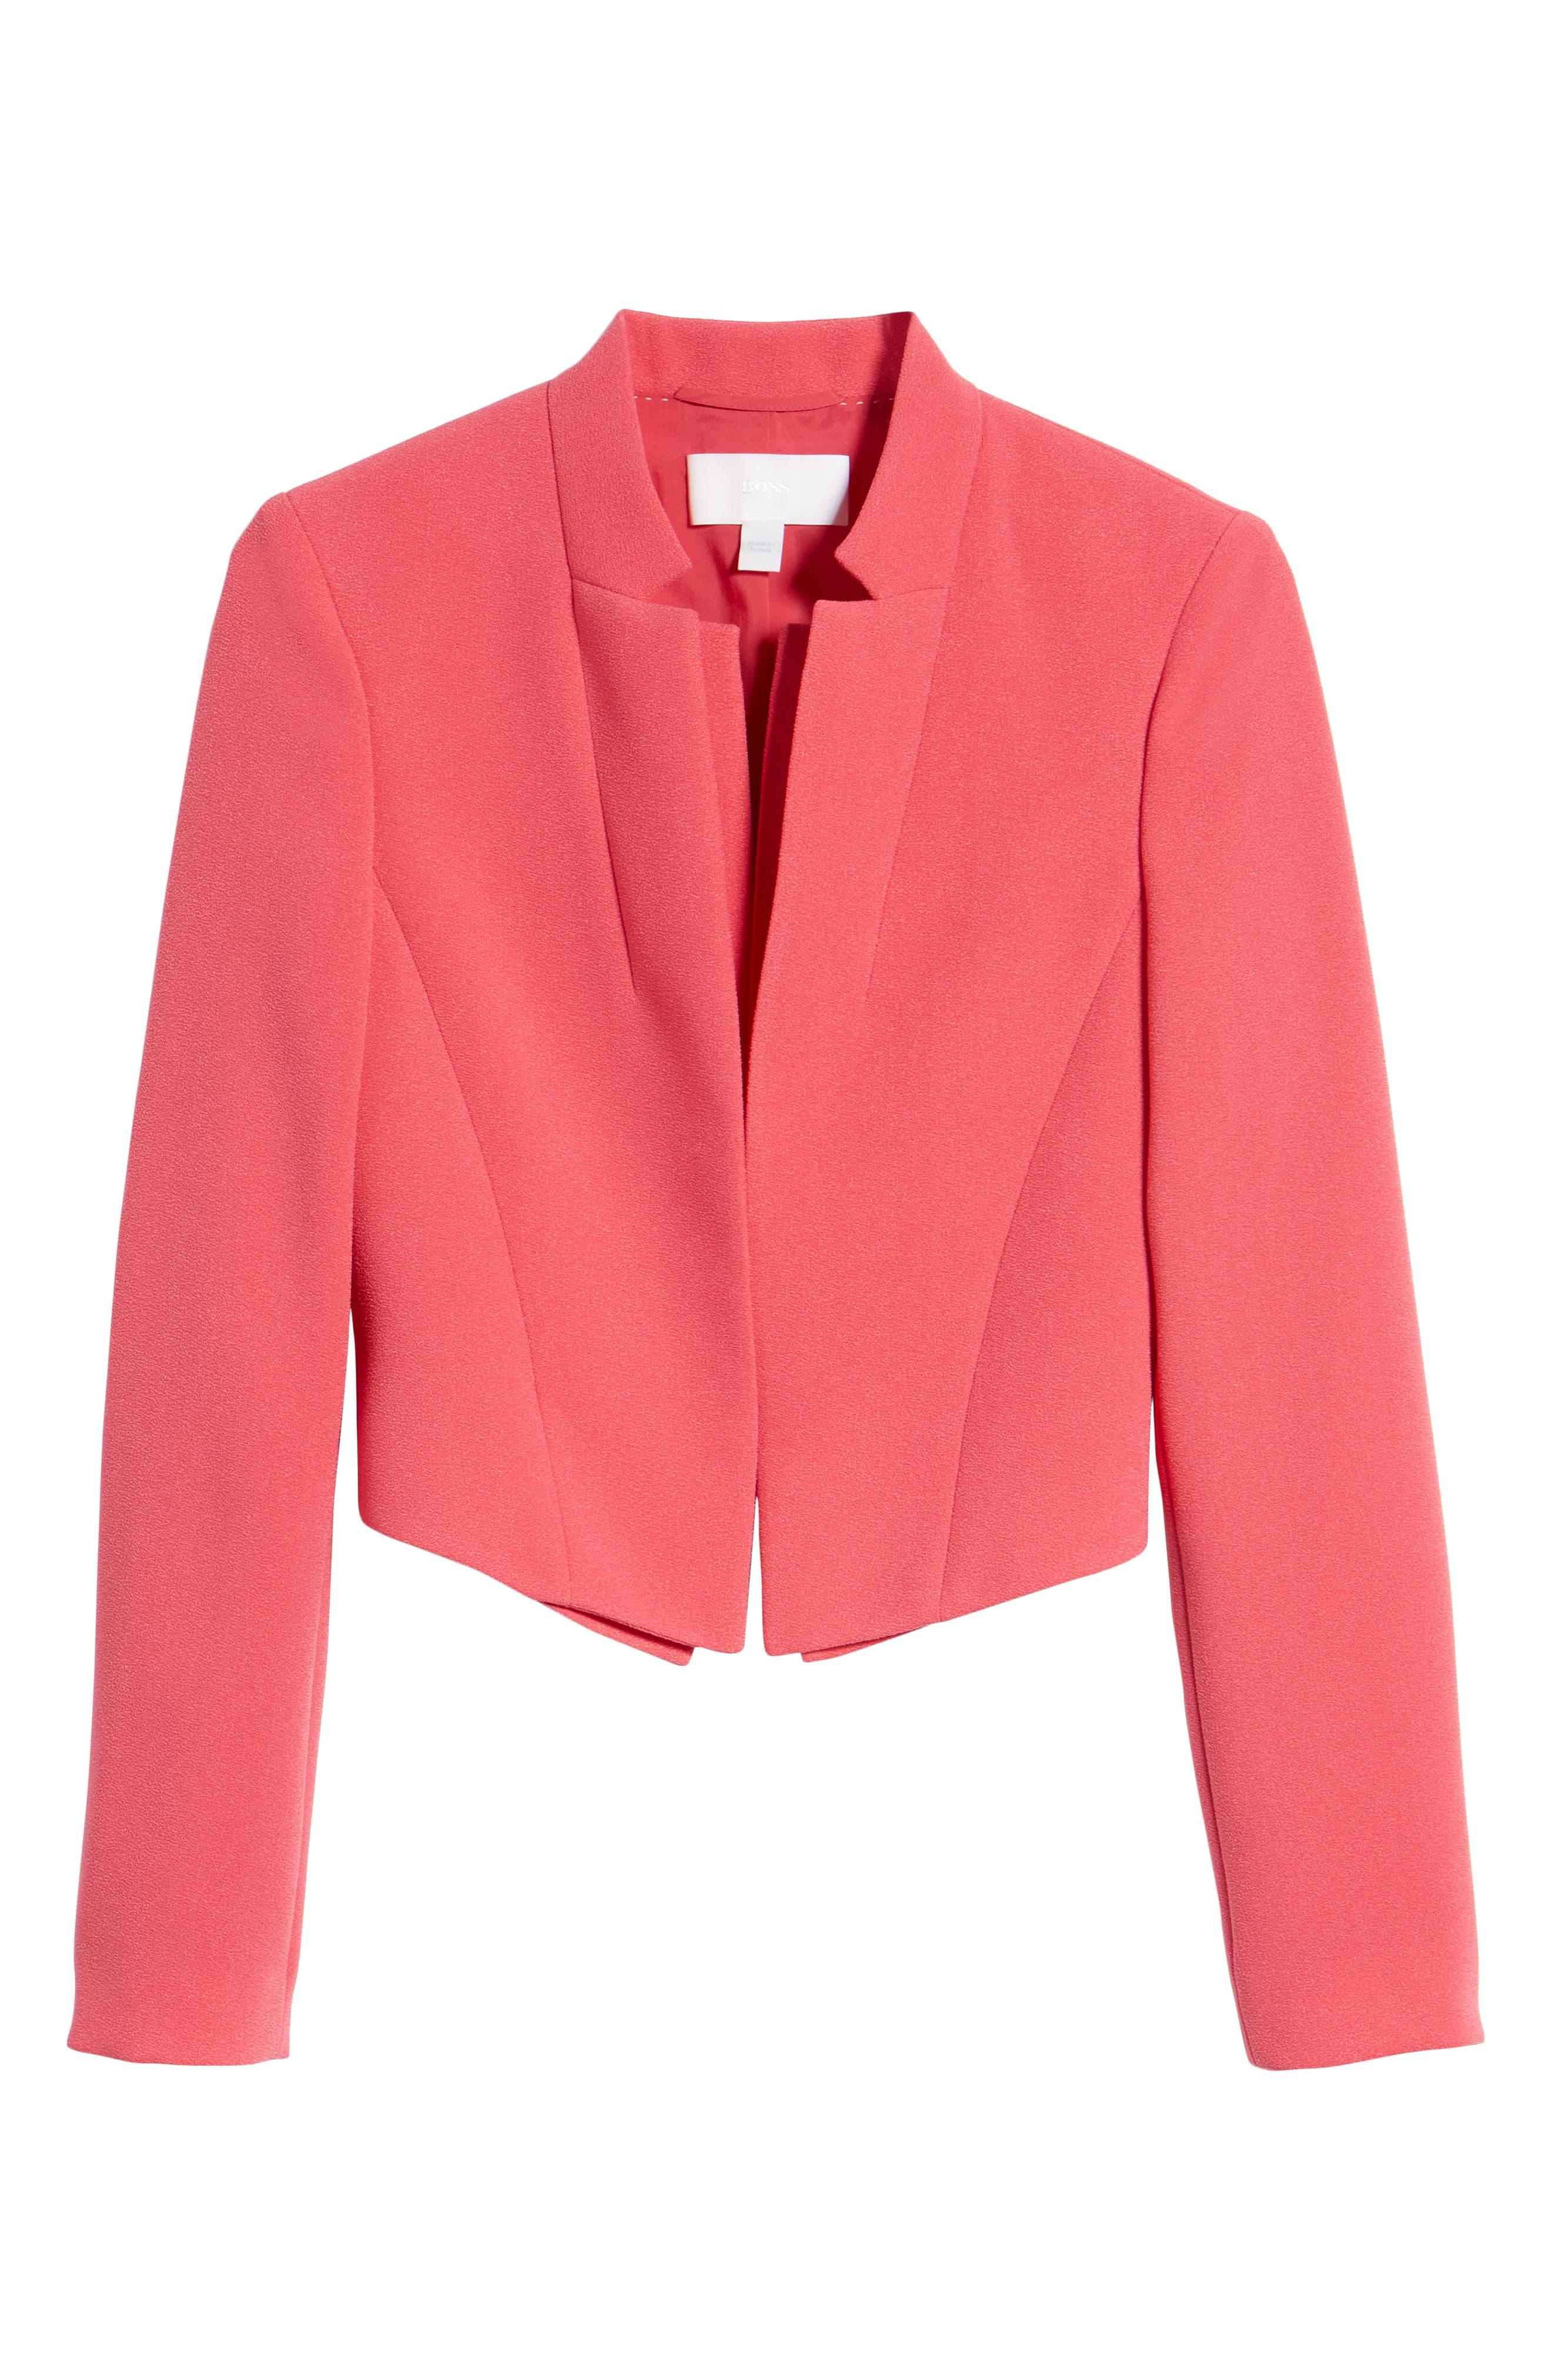 Jisala Compact Crepe Crop Jacket,                             Alternate thumbnail 6, color,                             Lychee Pink